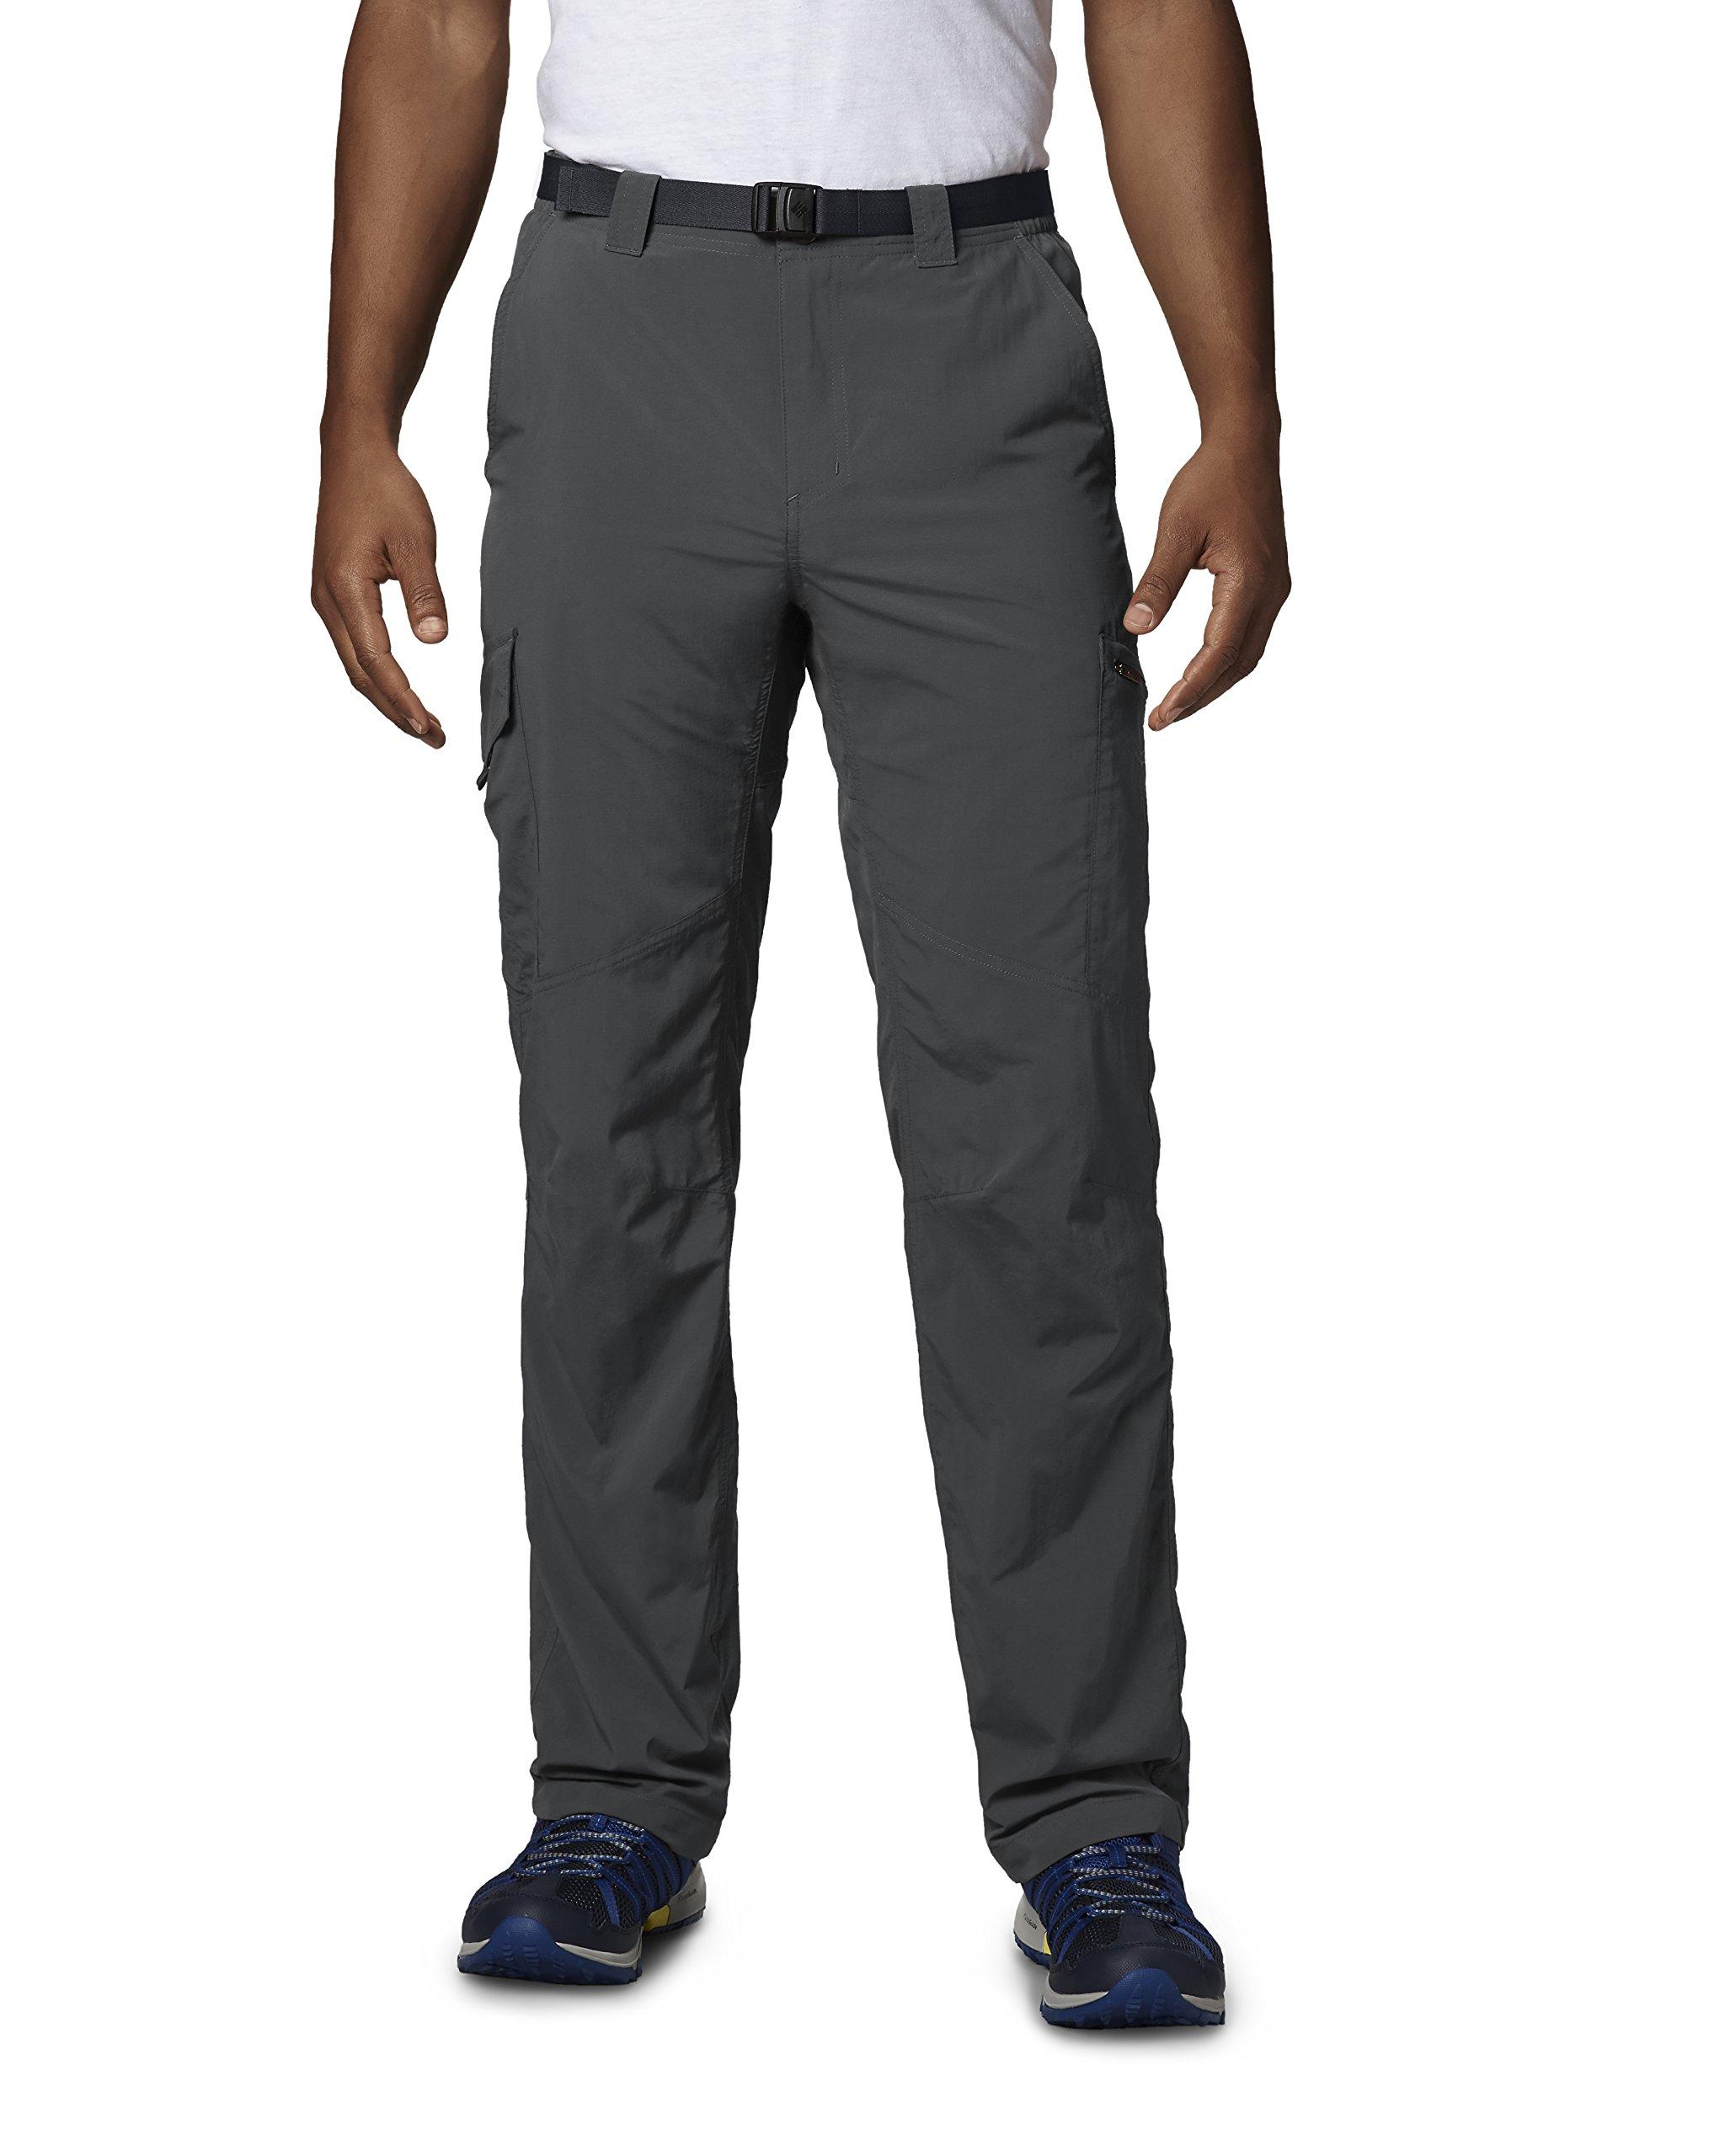 Columbia Silver Ridge Cargo Pant, Grill, 30 x 30-Inch